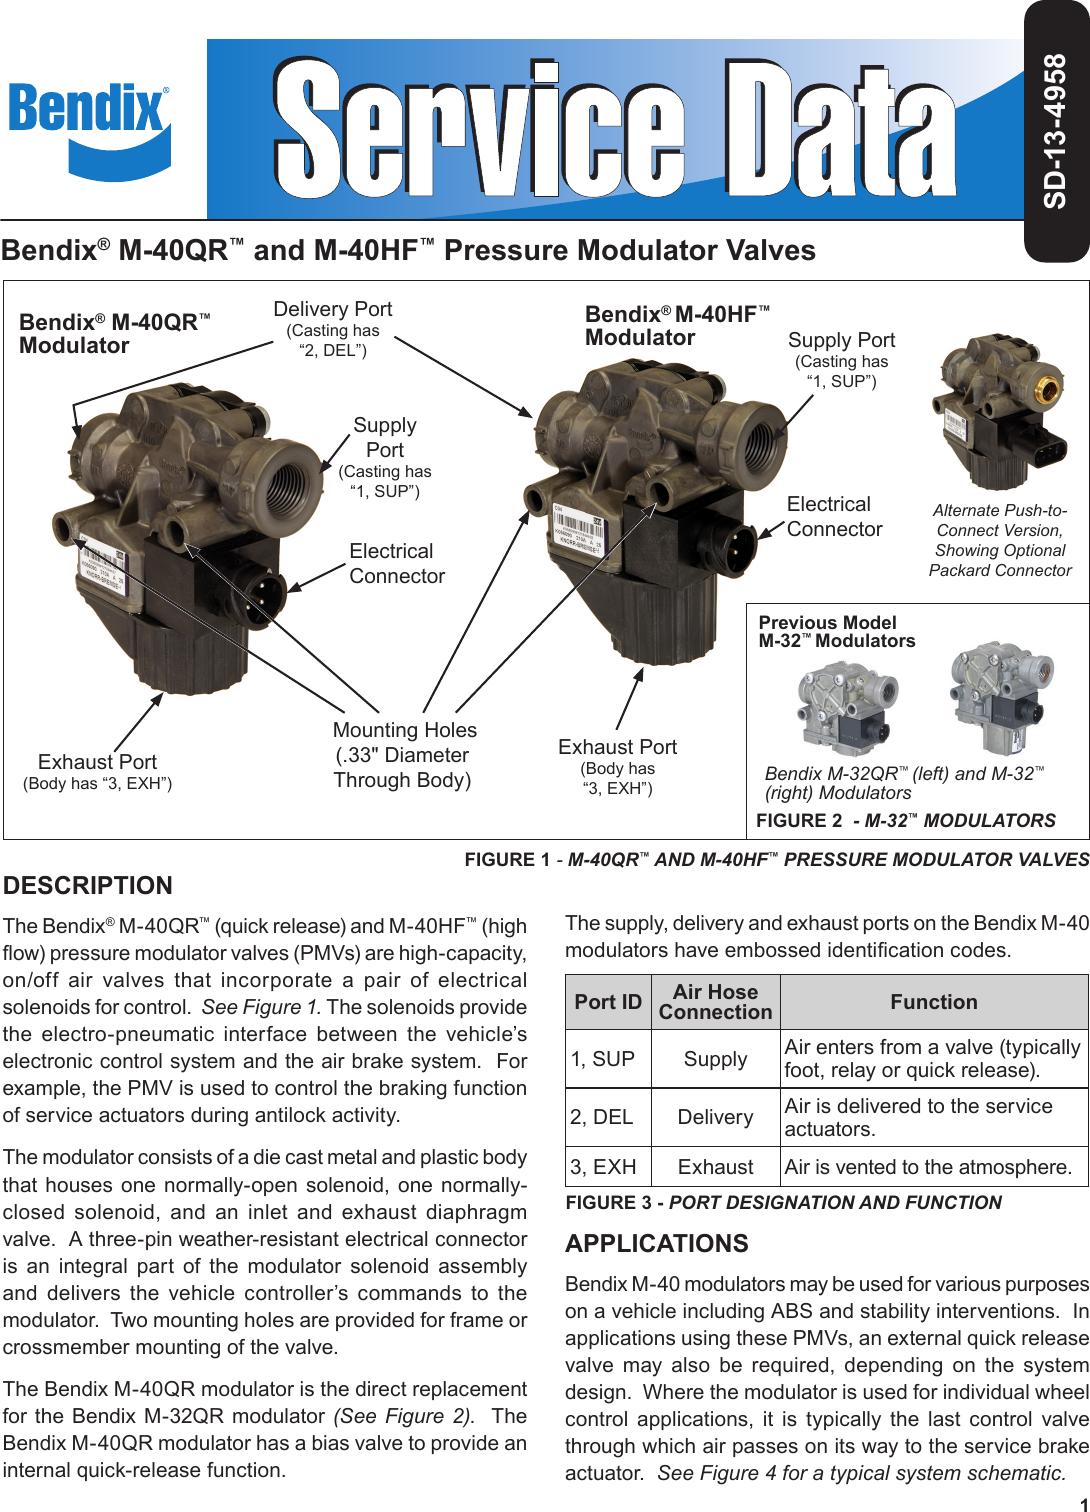 bendix air diagram, ford abs wiring diagram, bendix abs system, brake  system diagram